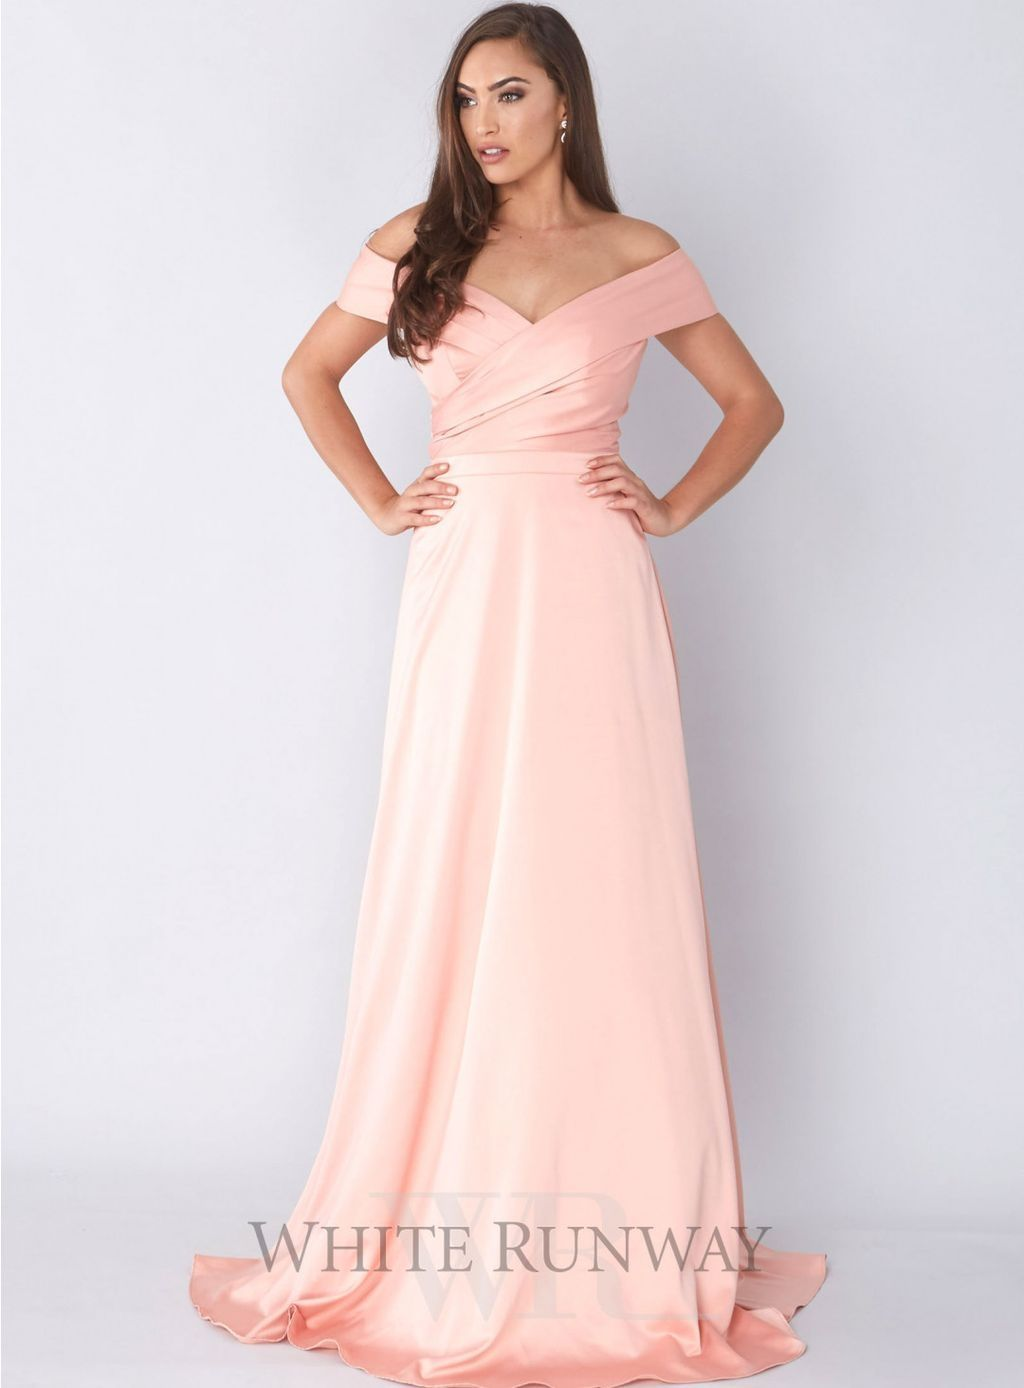 56 Beautiful Pastel Wedding Gowns Design Ideas | Pinterest | Gowns ...